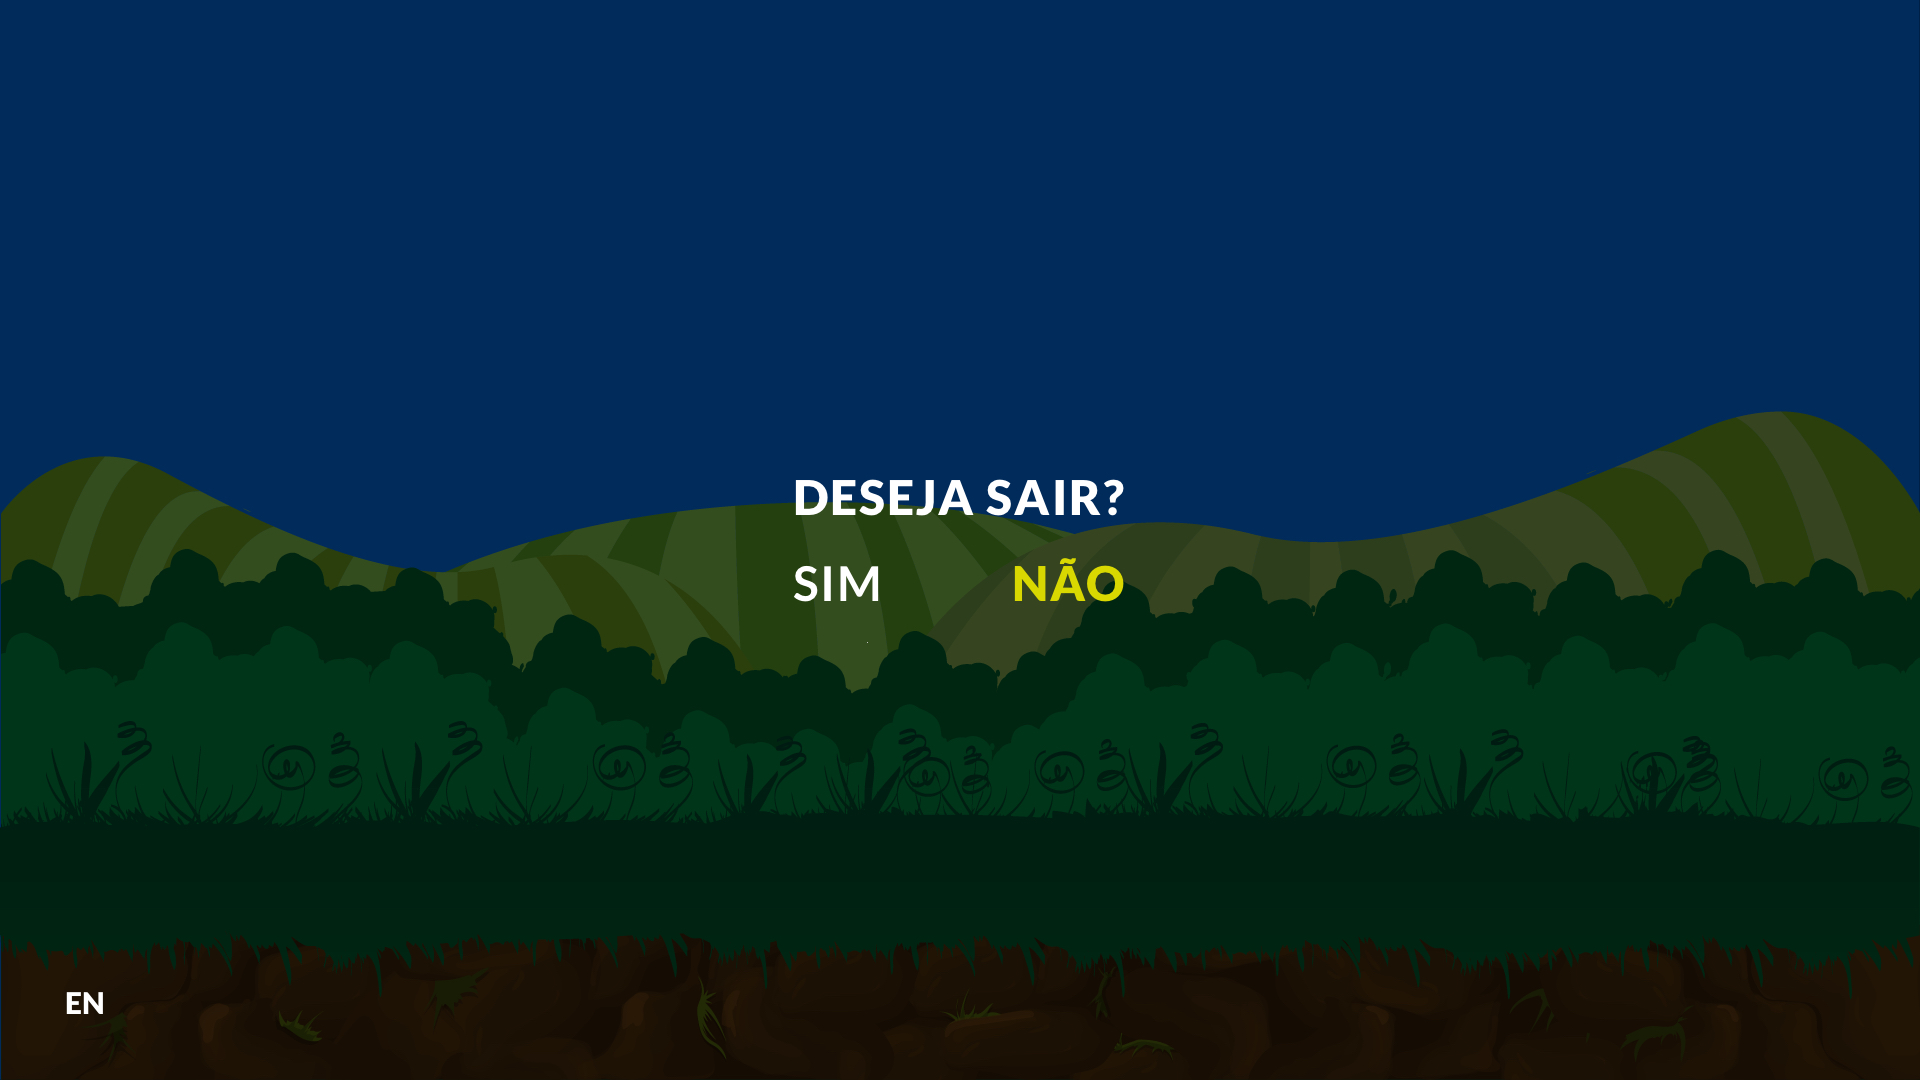 DESEJA SAIR